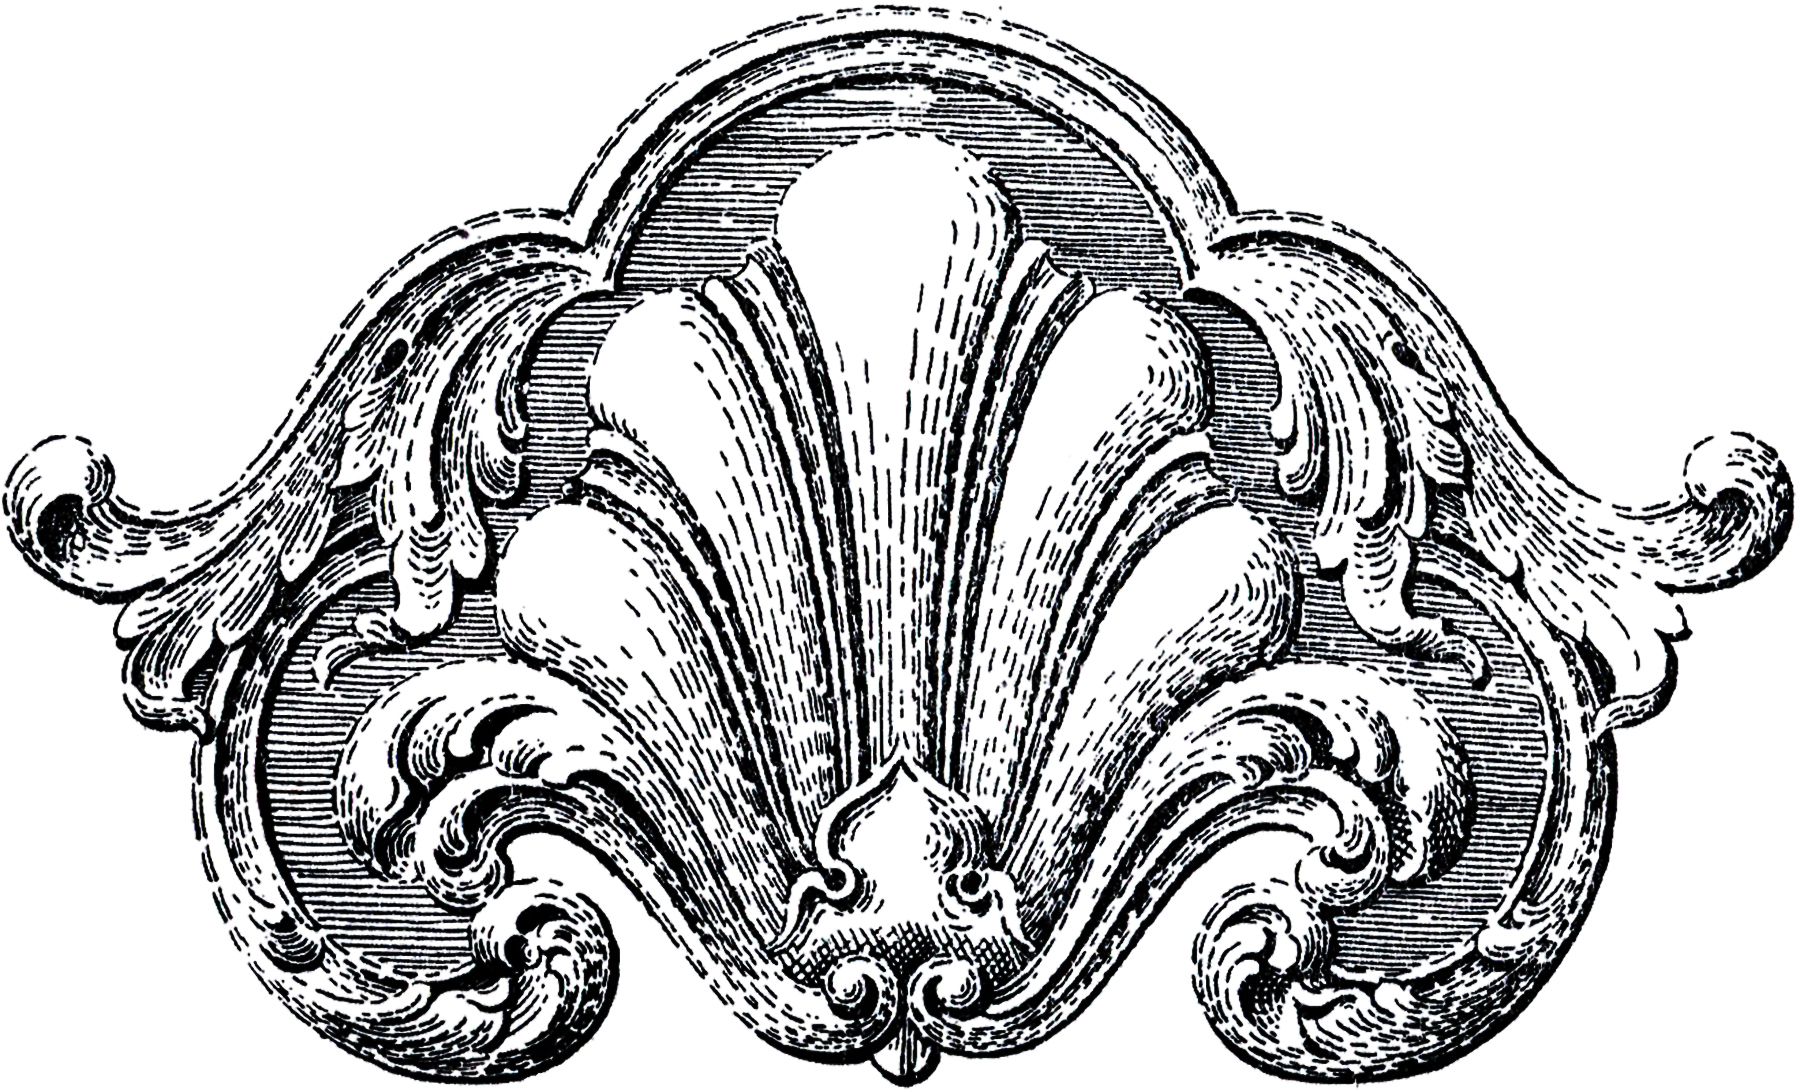 Vintage Ornate Scroll Ornament Image